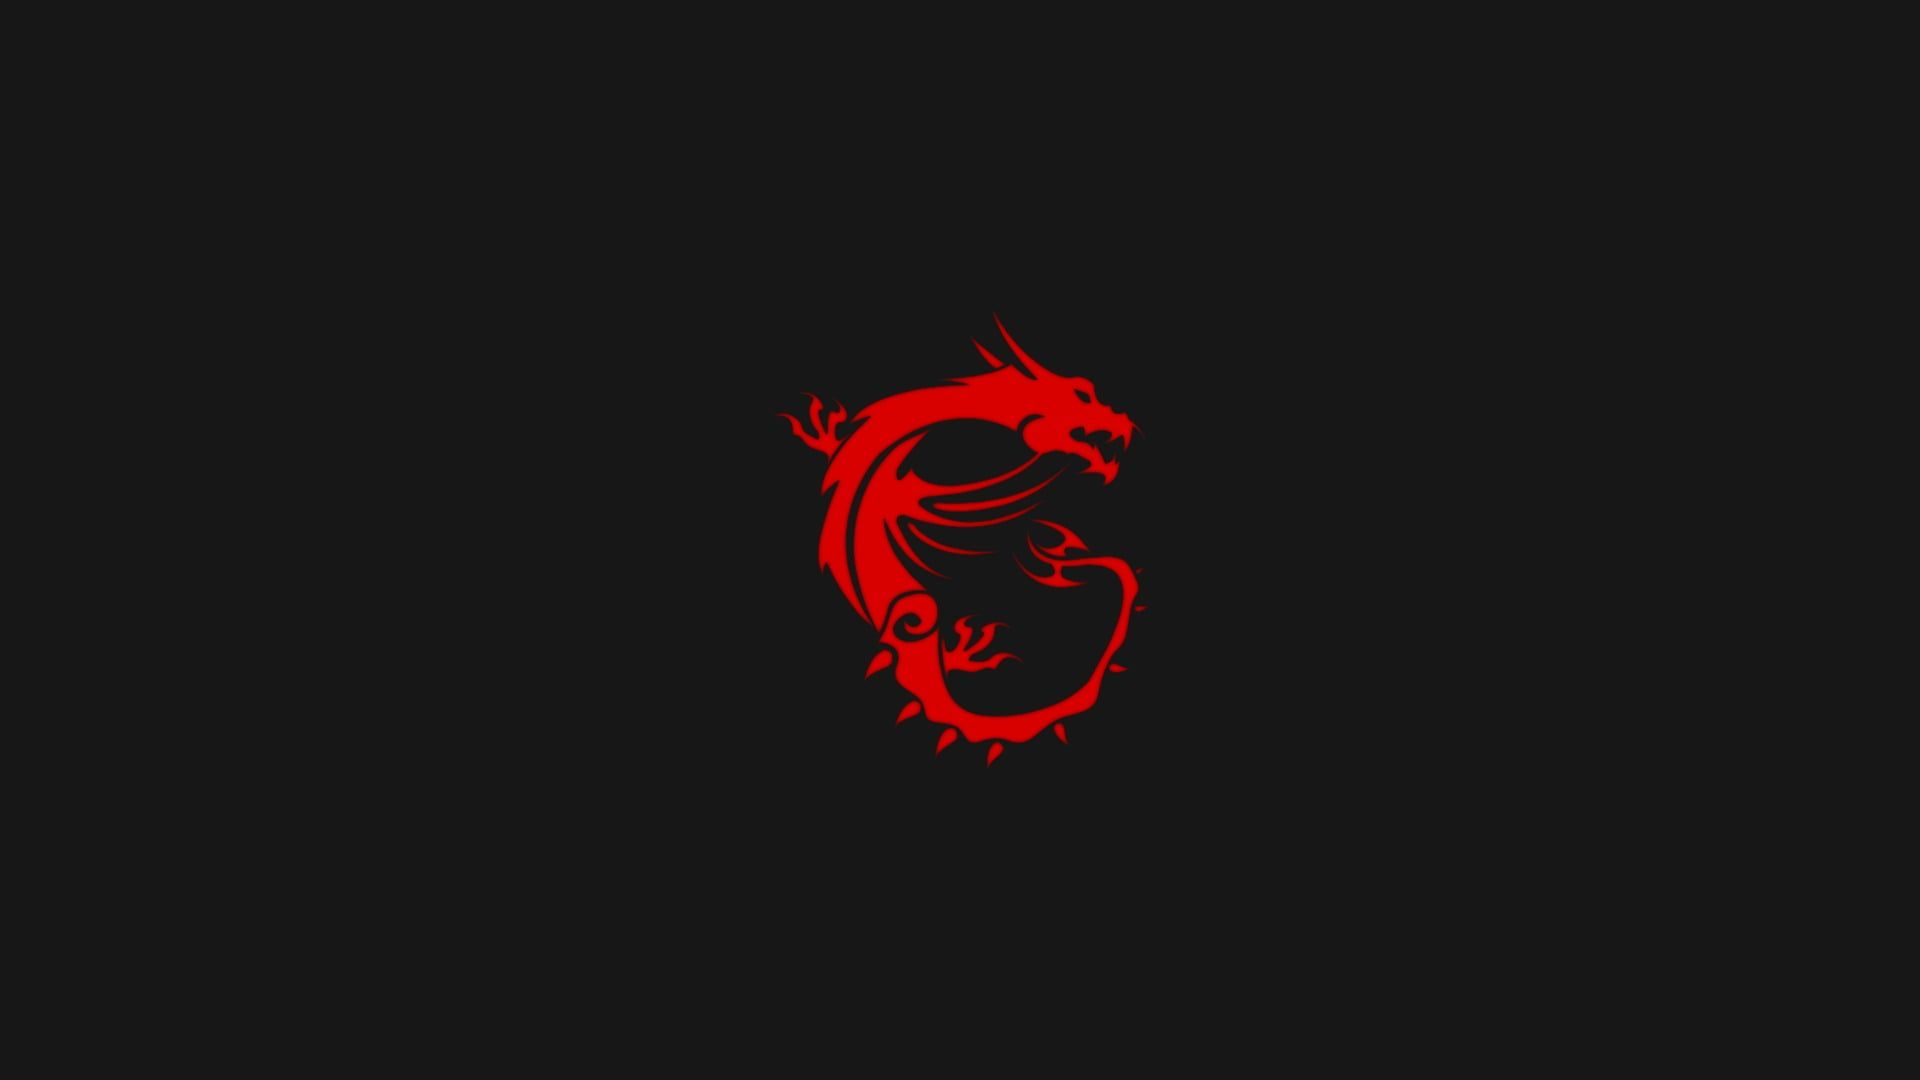 Red Dragon Digital Wallpaper Msi Simple Minimalism